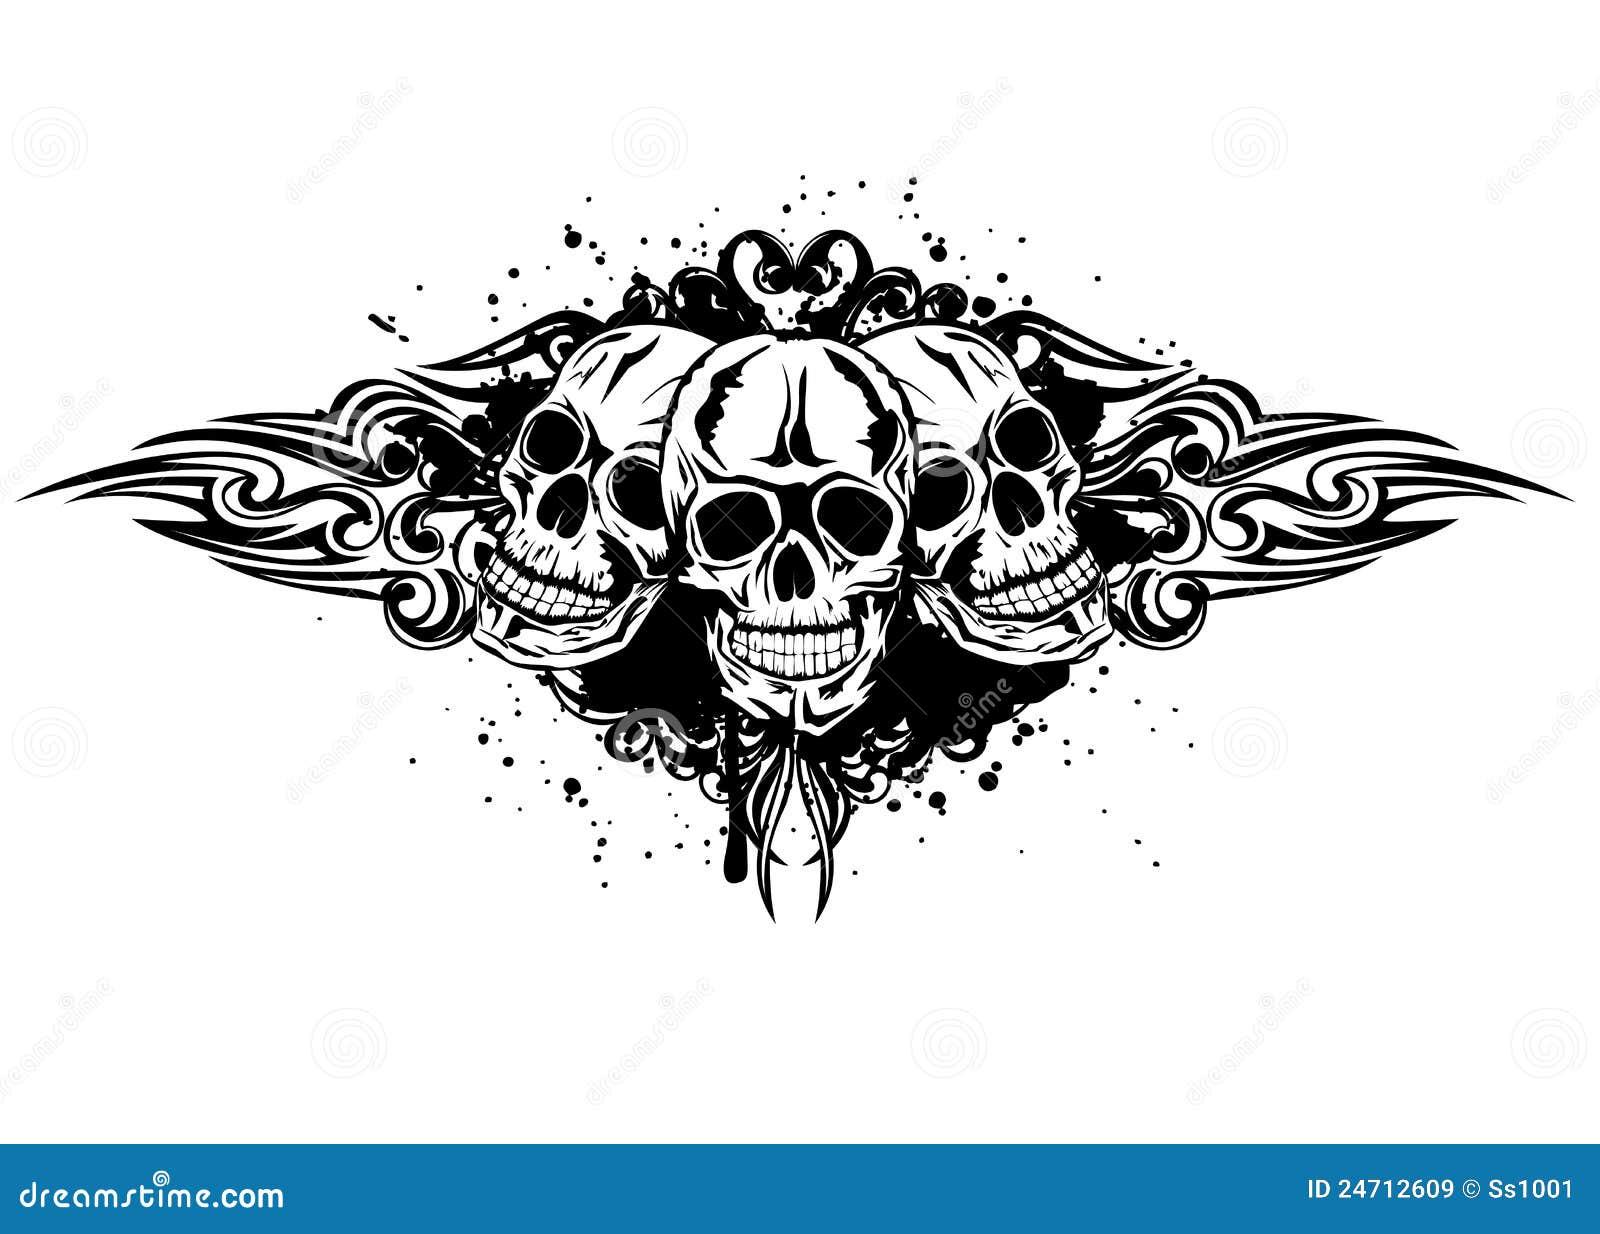 three skulls royalty free stock images